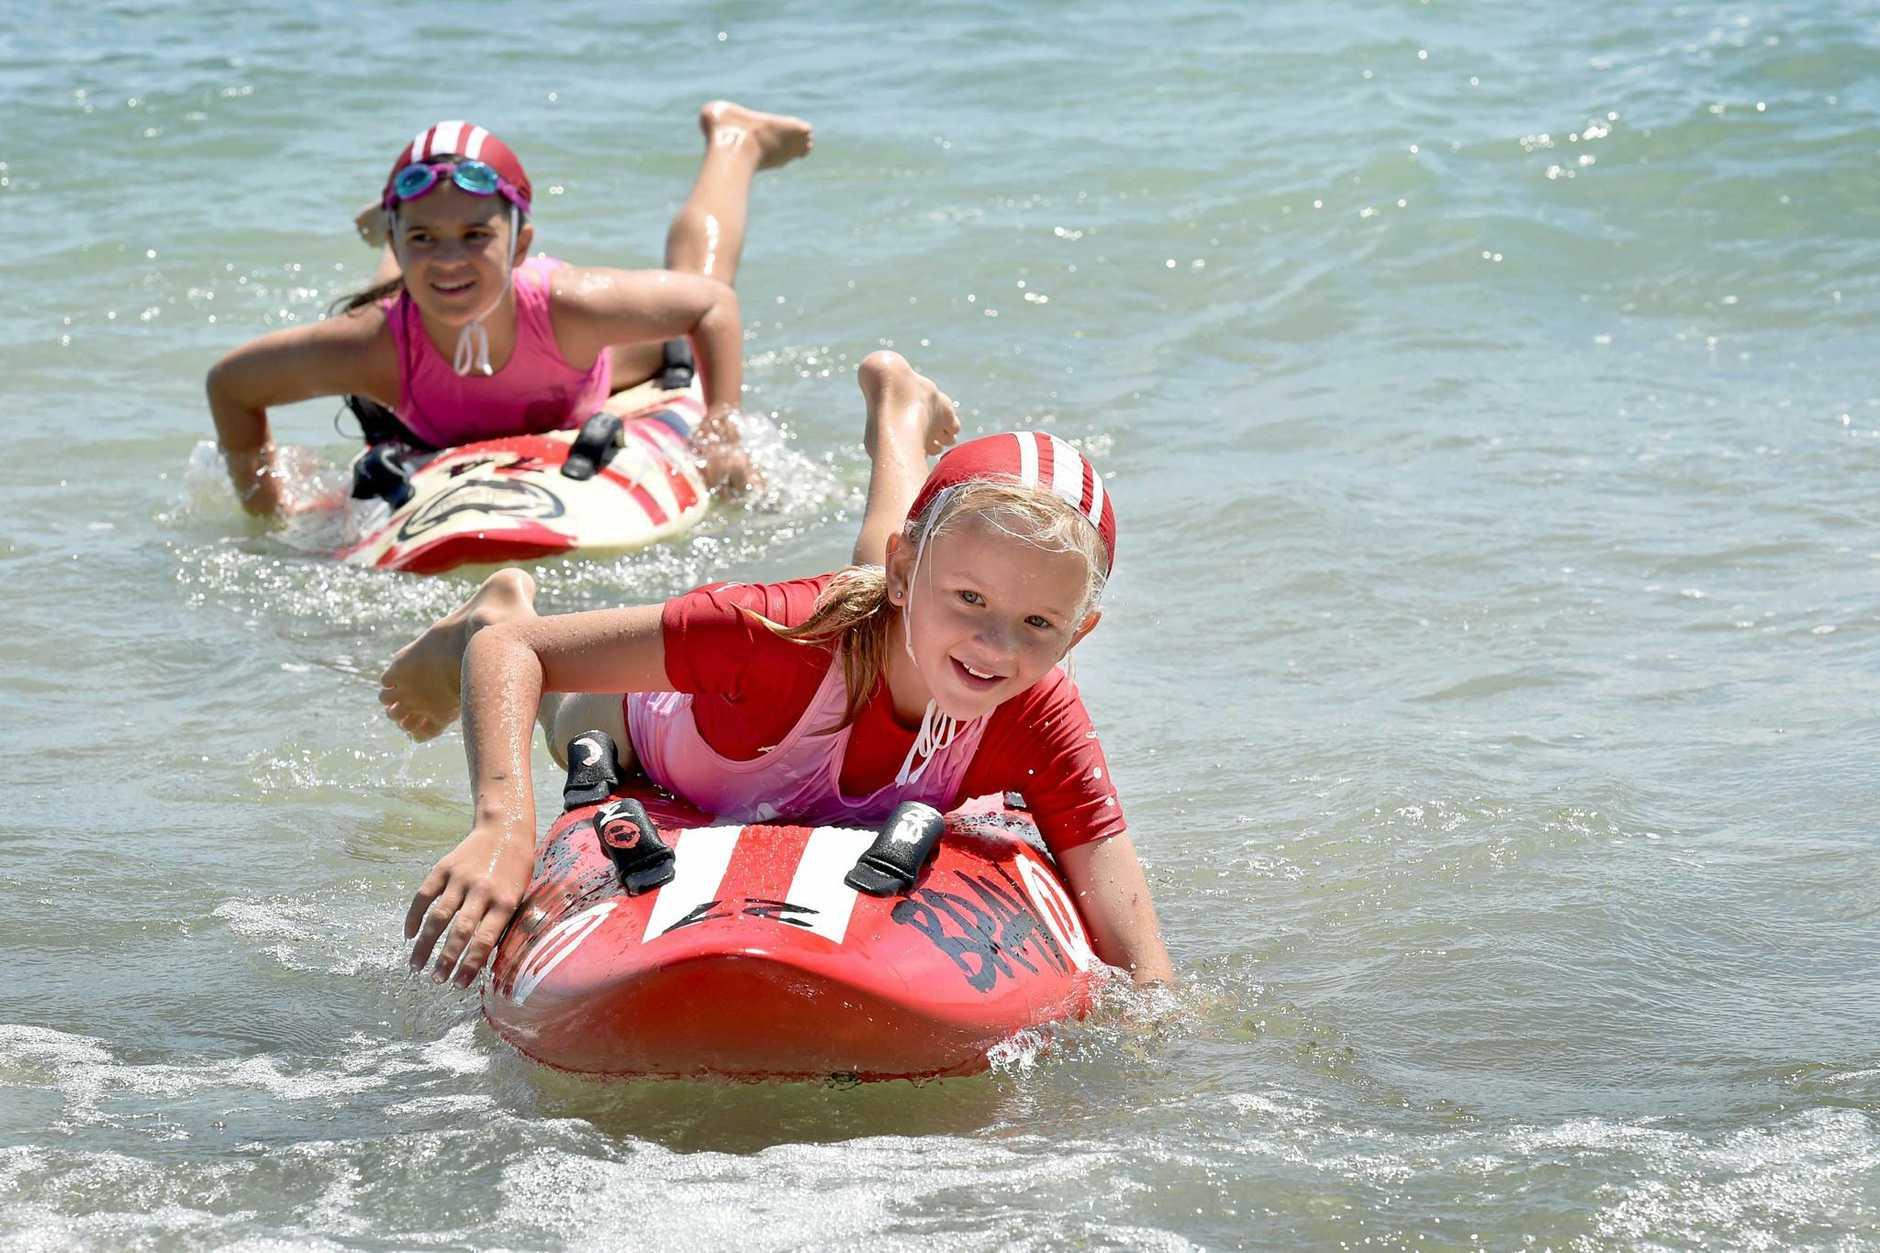 Hervey Bay Surf Lifesaving Club nippers - Under 11 Bella Thom.